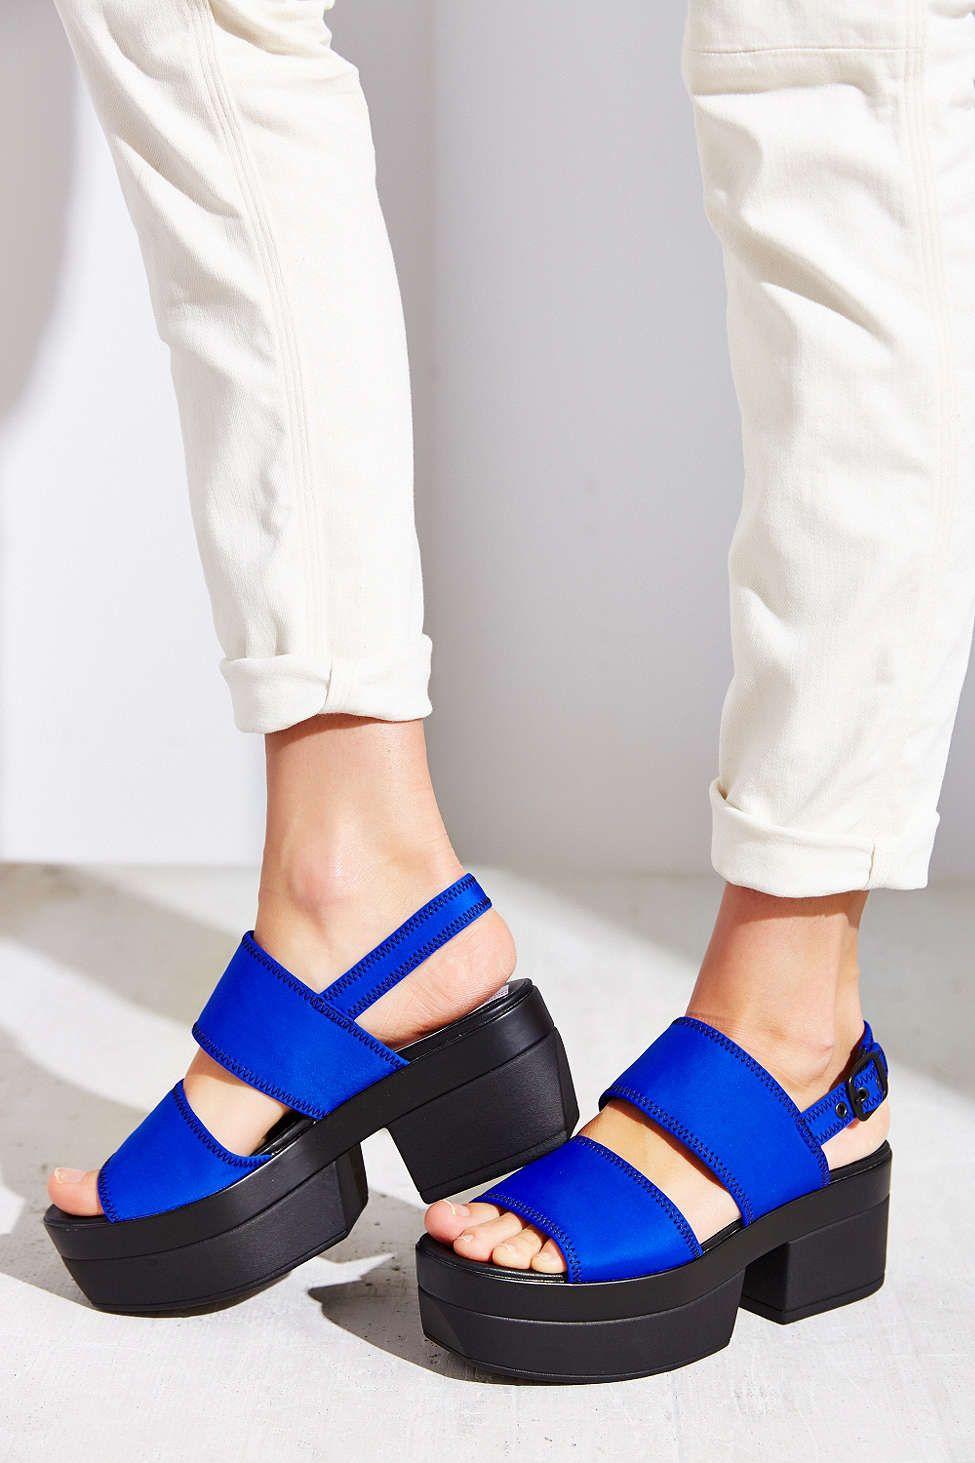 ee3160e448e Vagabond Neoprene Sandals  blue  scuba  shoelust. Vagabond Lindi Sandal - Urban  Outfitters ...